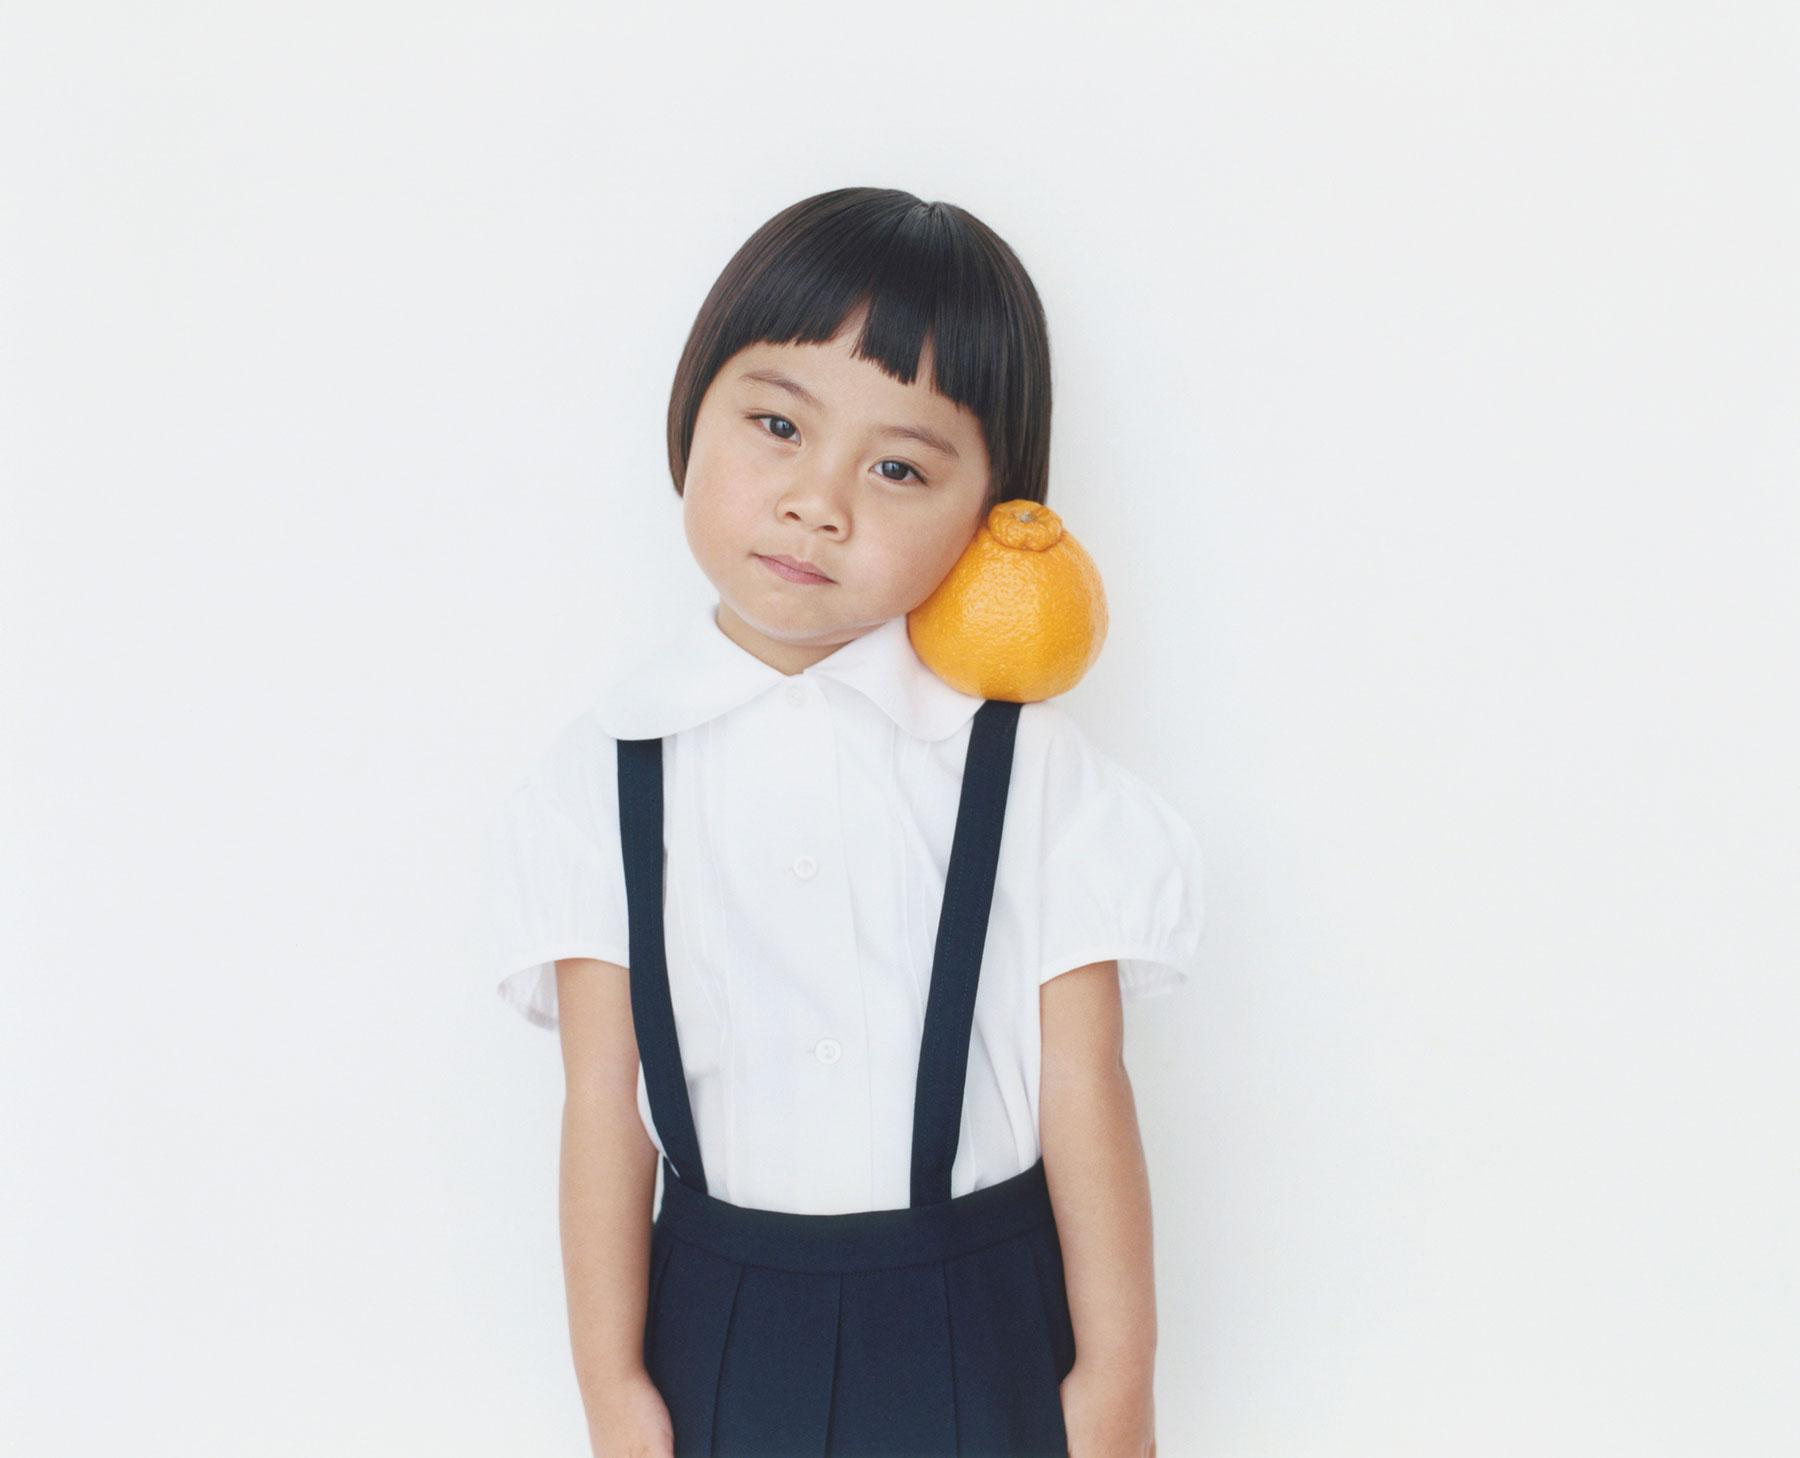 Osamu Yokonami,  1000 Children: Sumo Mandarin No. 71 , 2010-2013  Digital pigment print, 895 x 1105 mm (approx. 34.25 x 43.5 in), edition of 5; 146 x 168 mm (approx. 5.75 x 6.6 in), edition of 10   Inquire